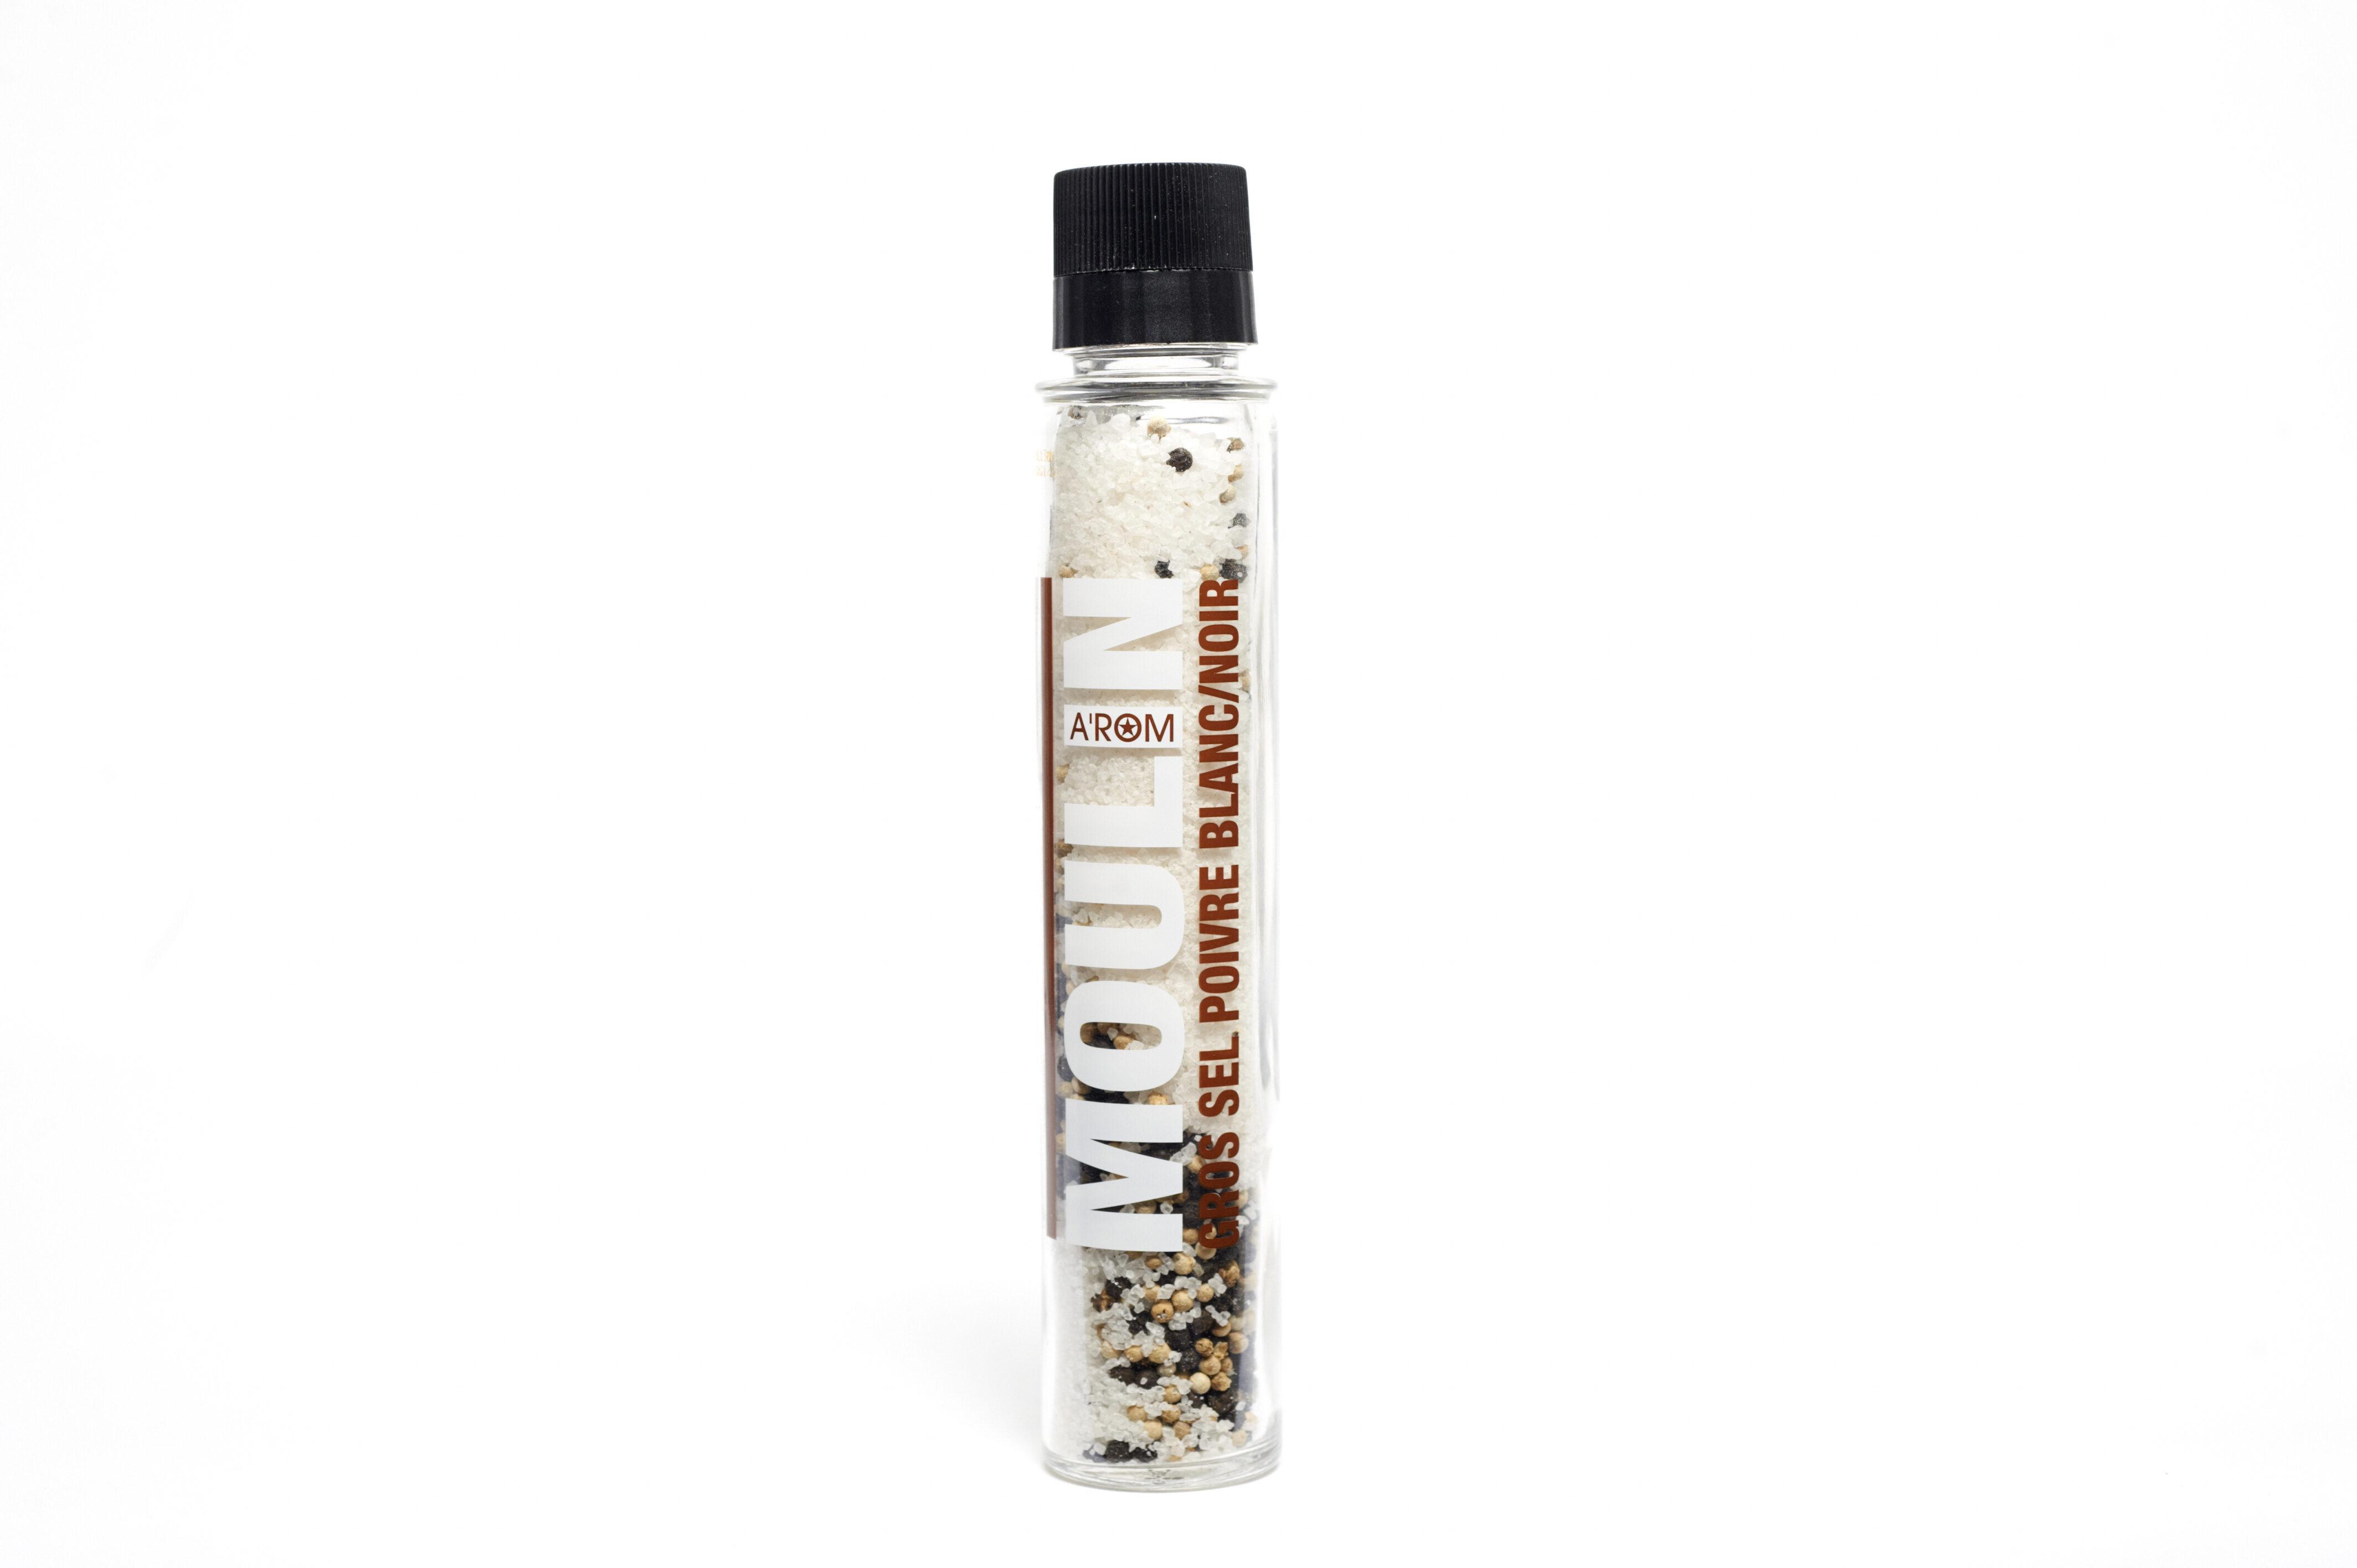 Moulin long Gros sel et poivre blanc et noir - Produkt - fr